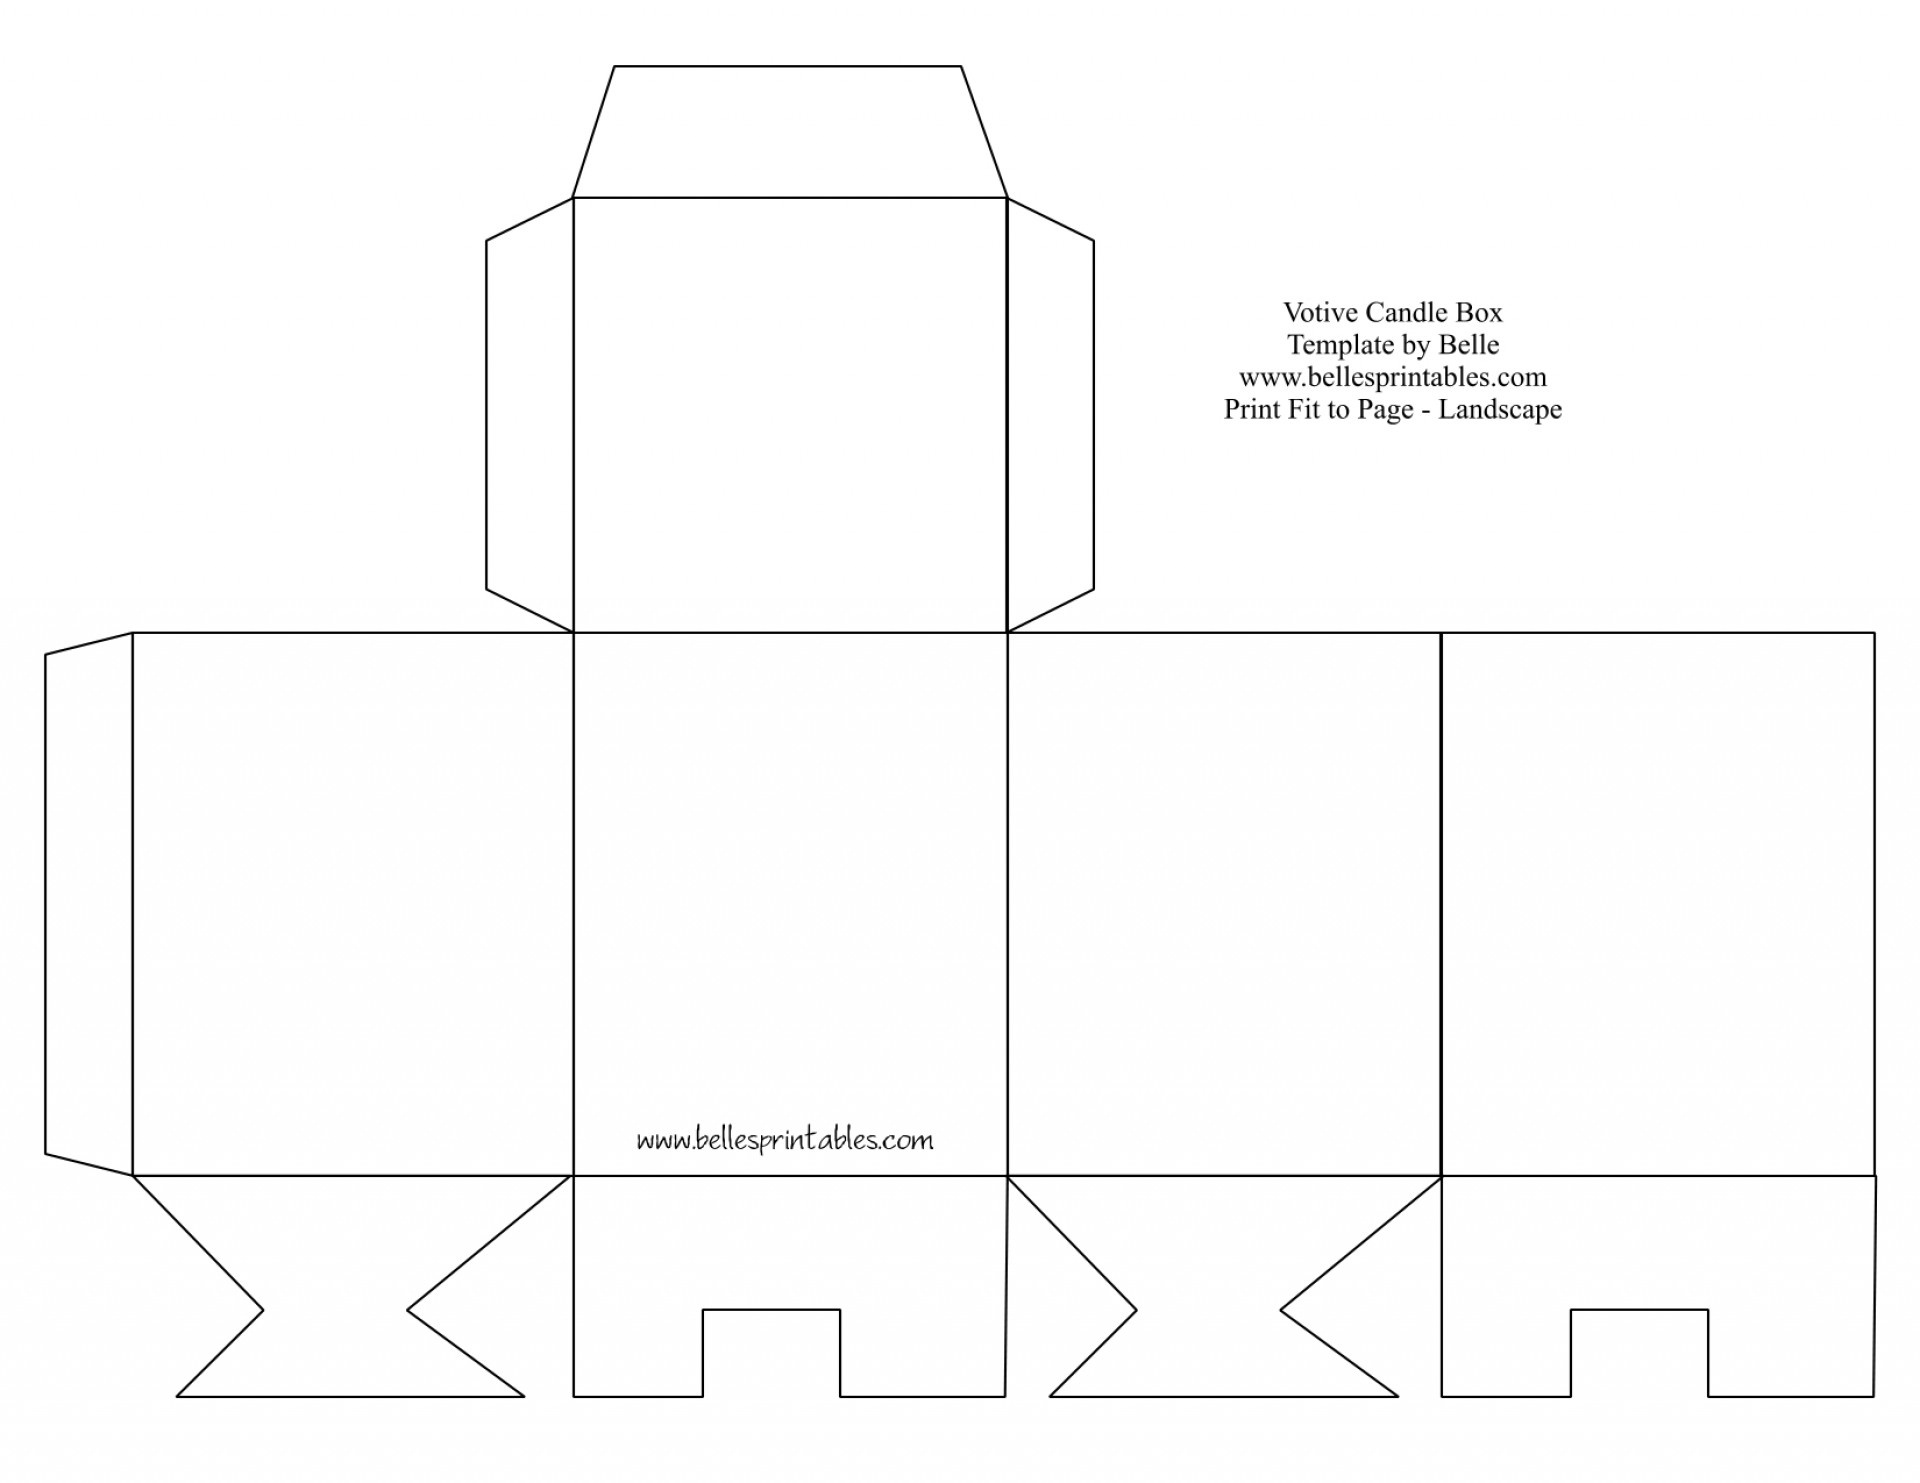 003 Box Templates Free Printable Template Ideas Unbelievable - Box Templates Free Printable